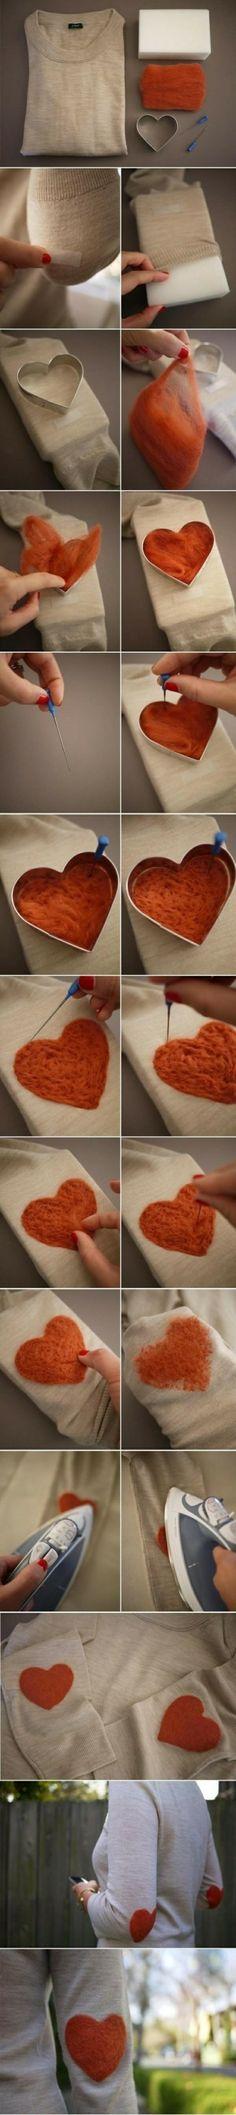 diy creative heart flower